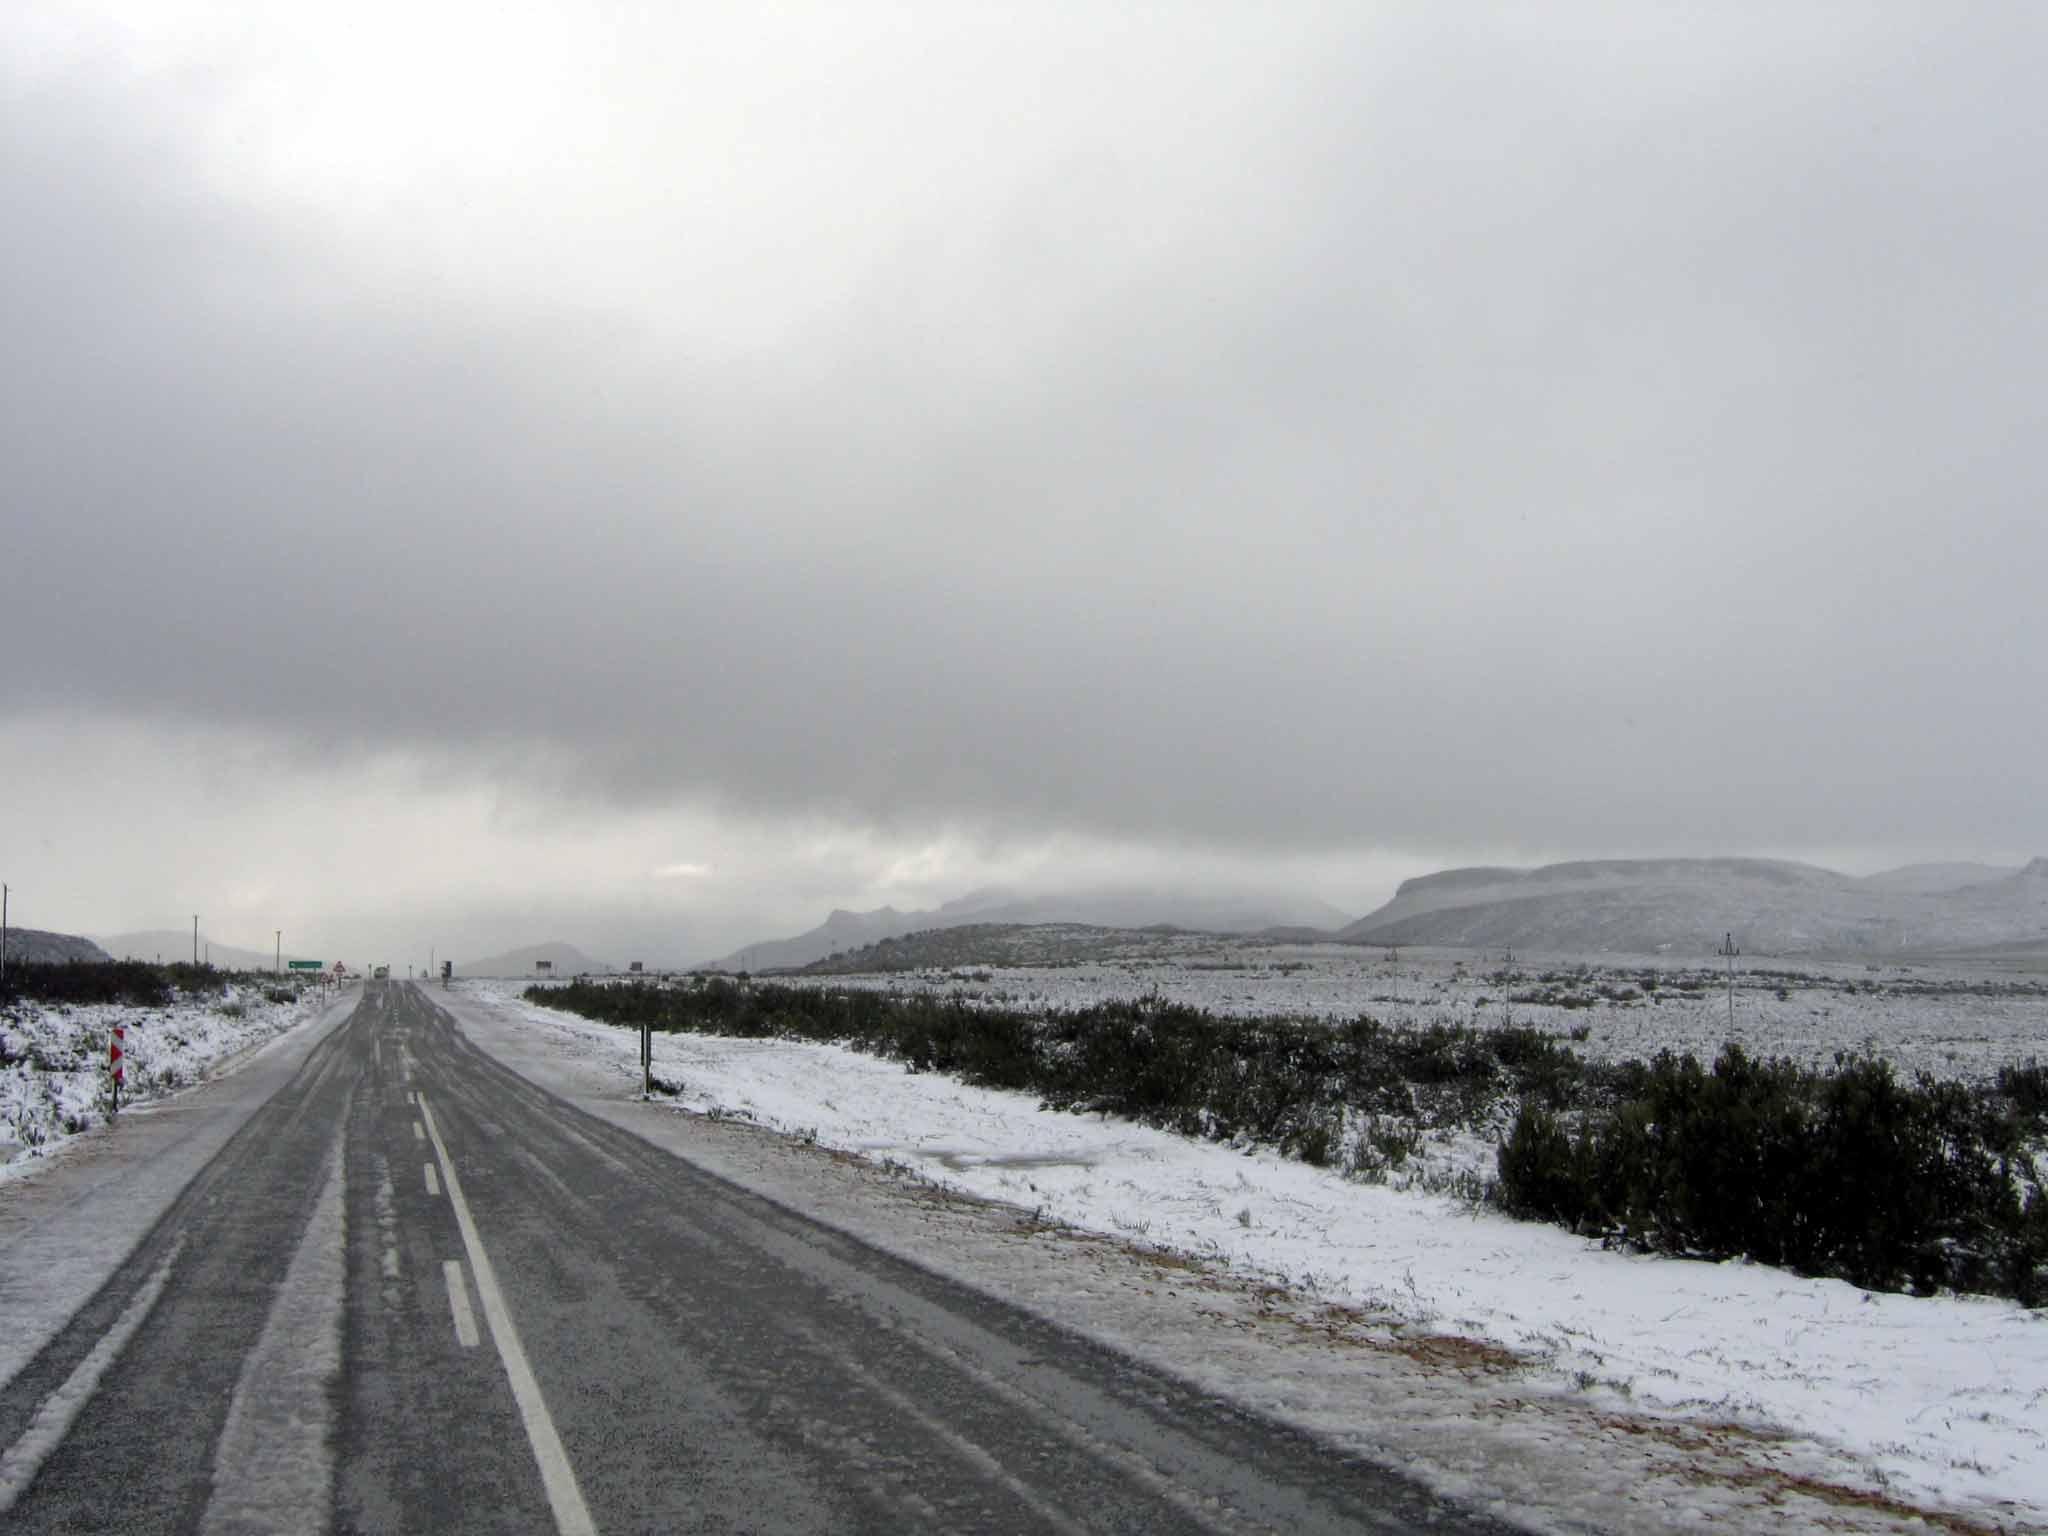 Swaarmoed Pass 1, Tiffindell